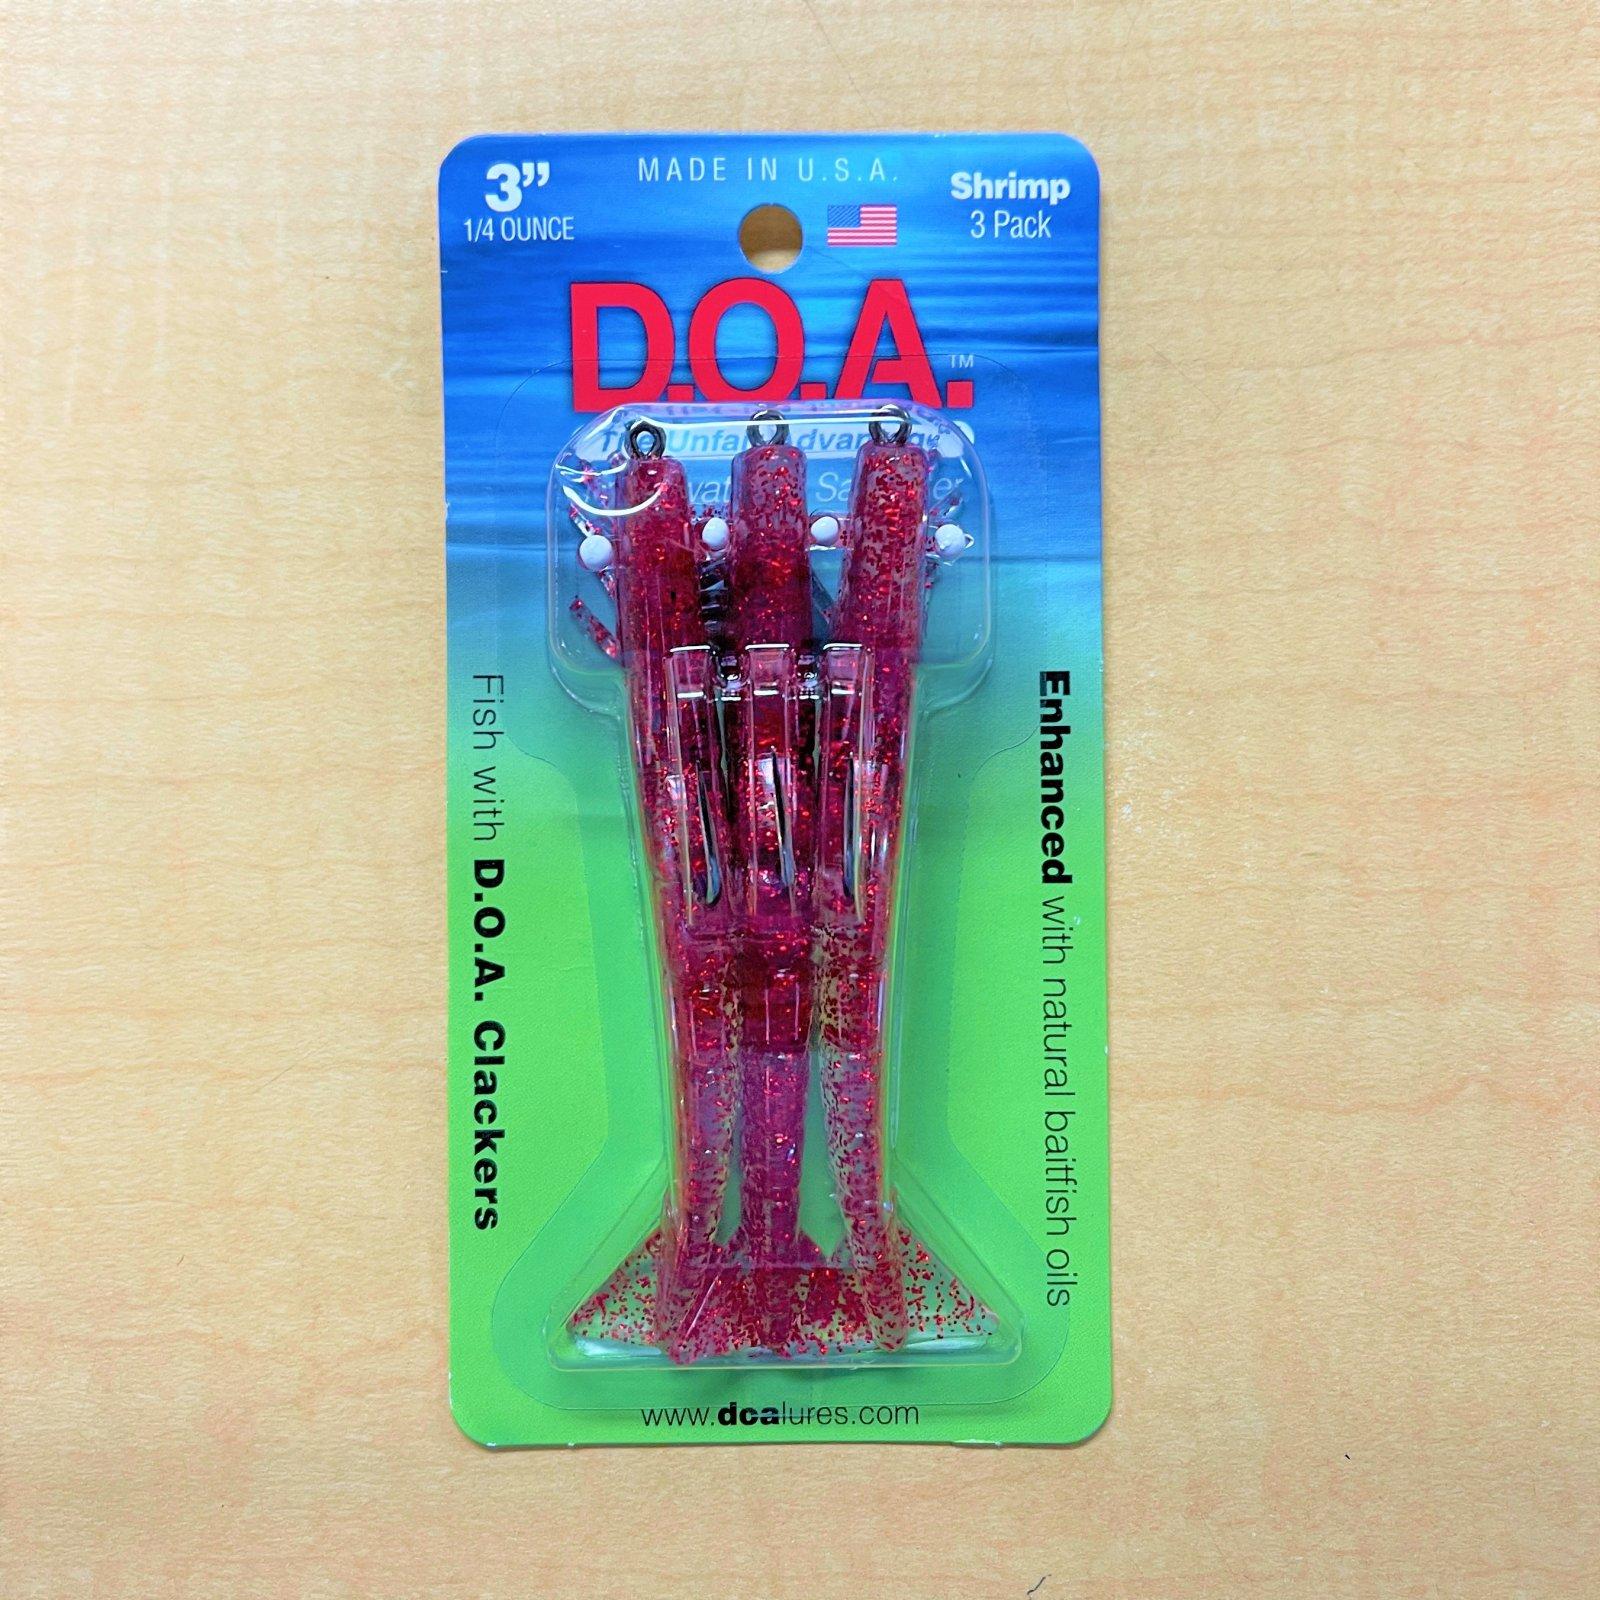 DOA Shrimp Clear/Red Glitter 3Pk 1/4oz - 3